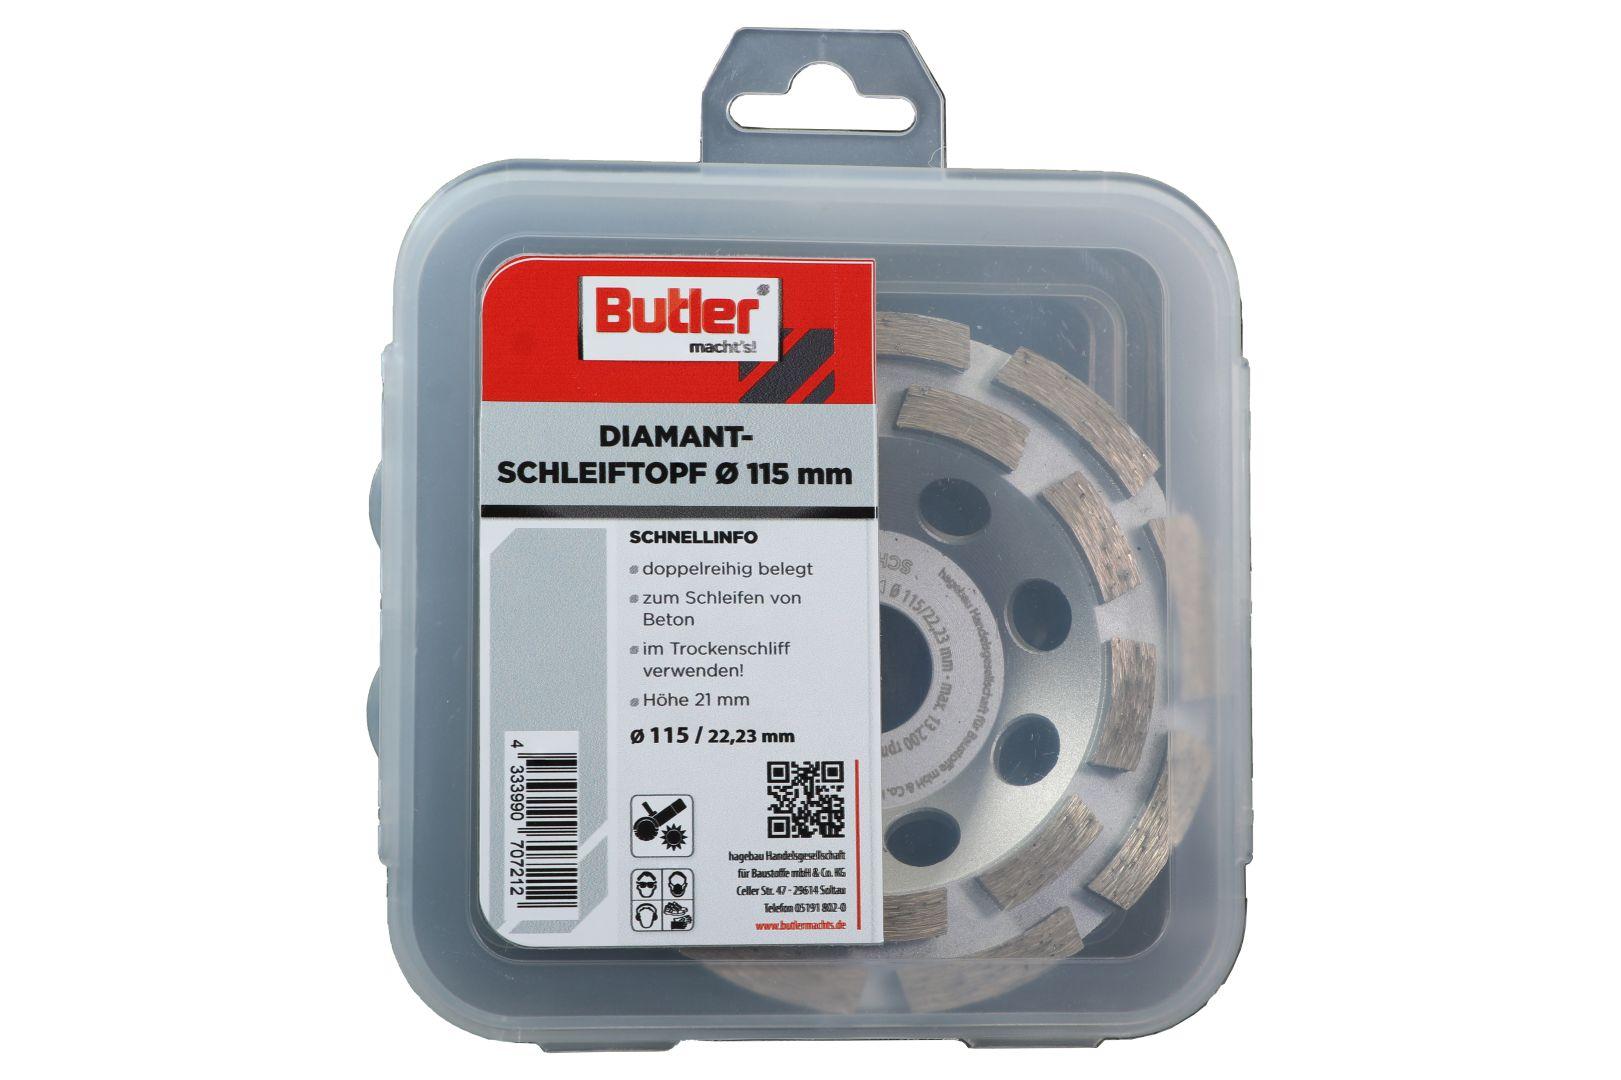 Butler macht's! Diamant-Schleiftopf, Schneidrand doppelt, Ø 115 mm